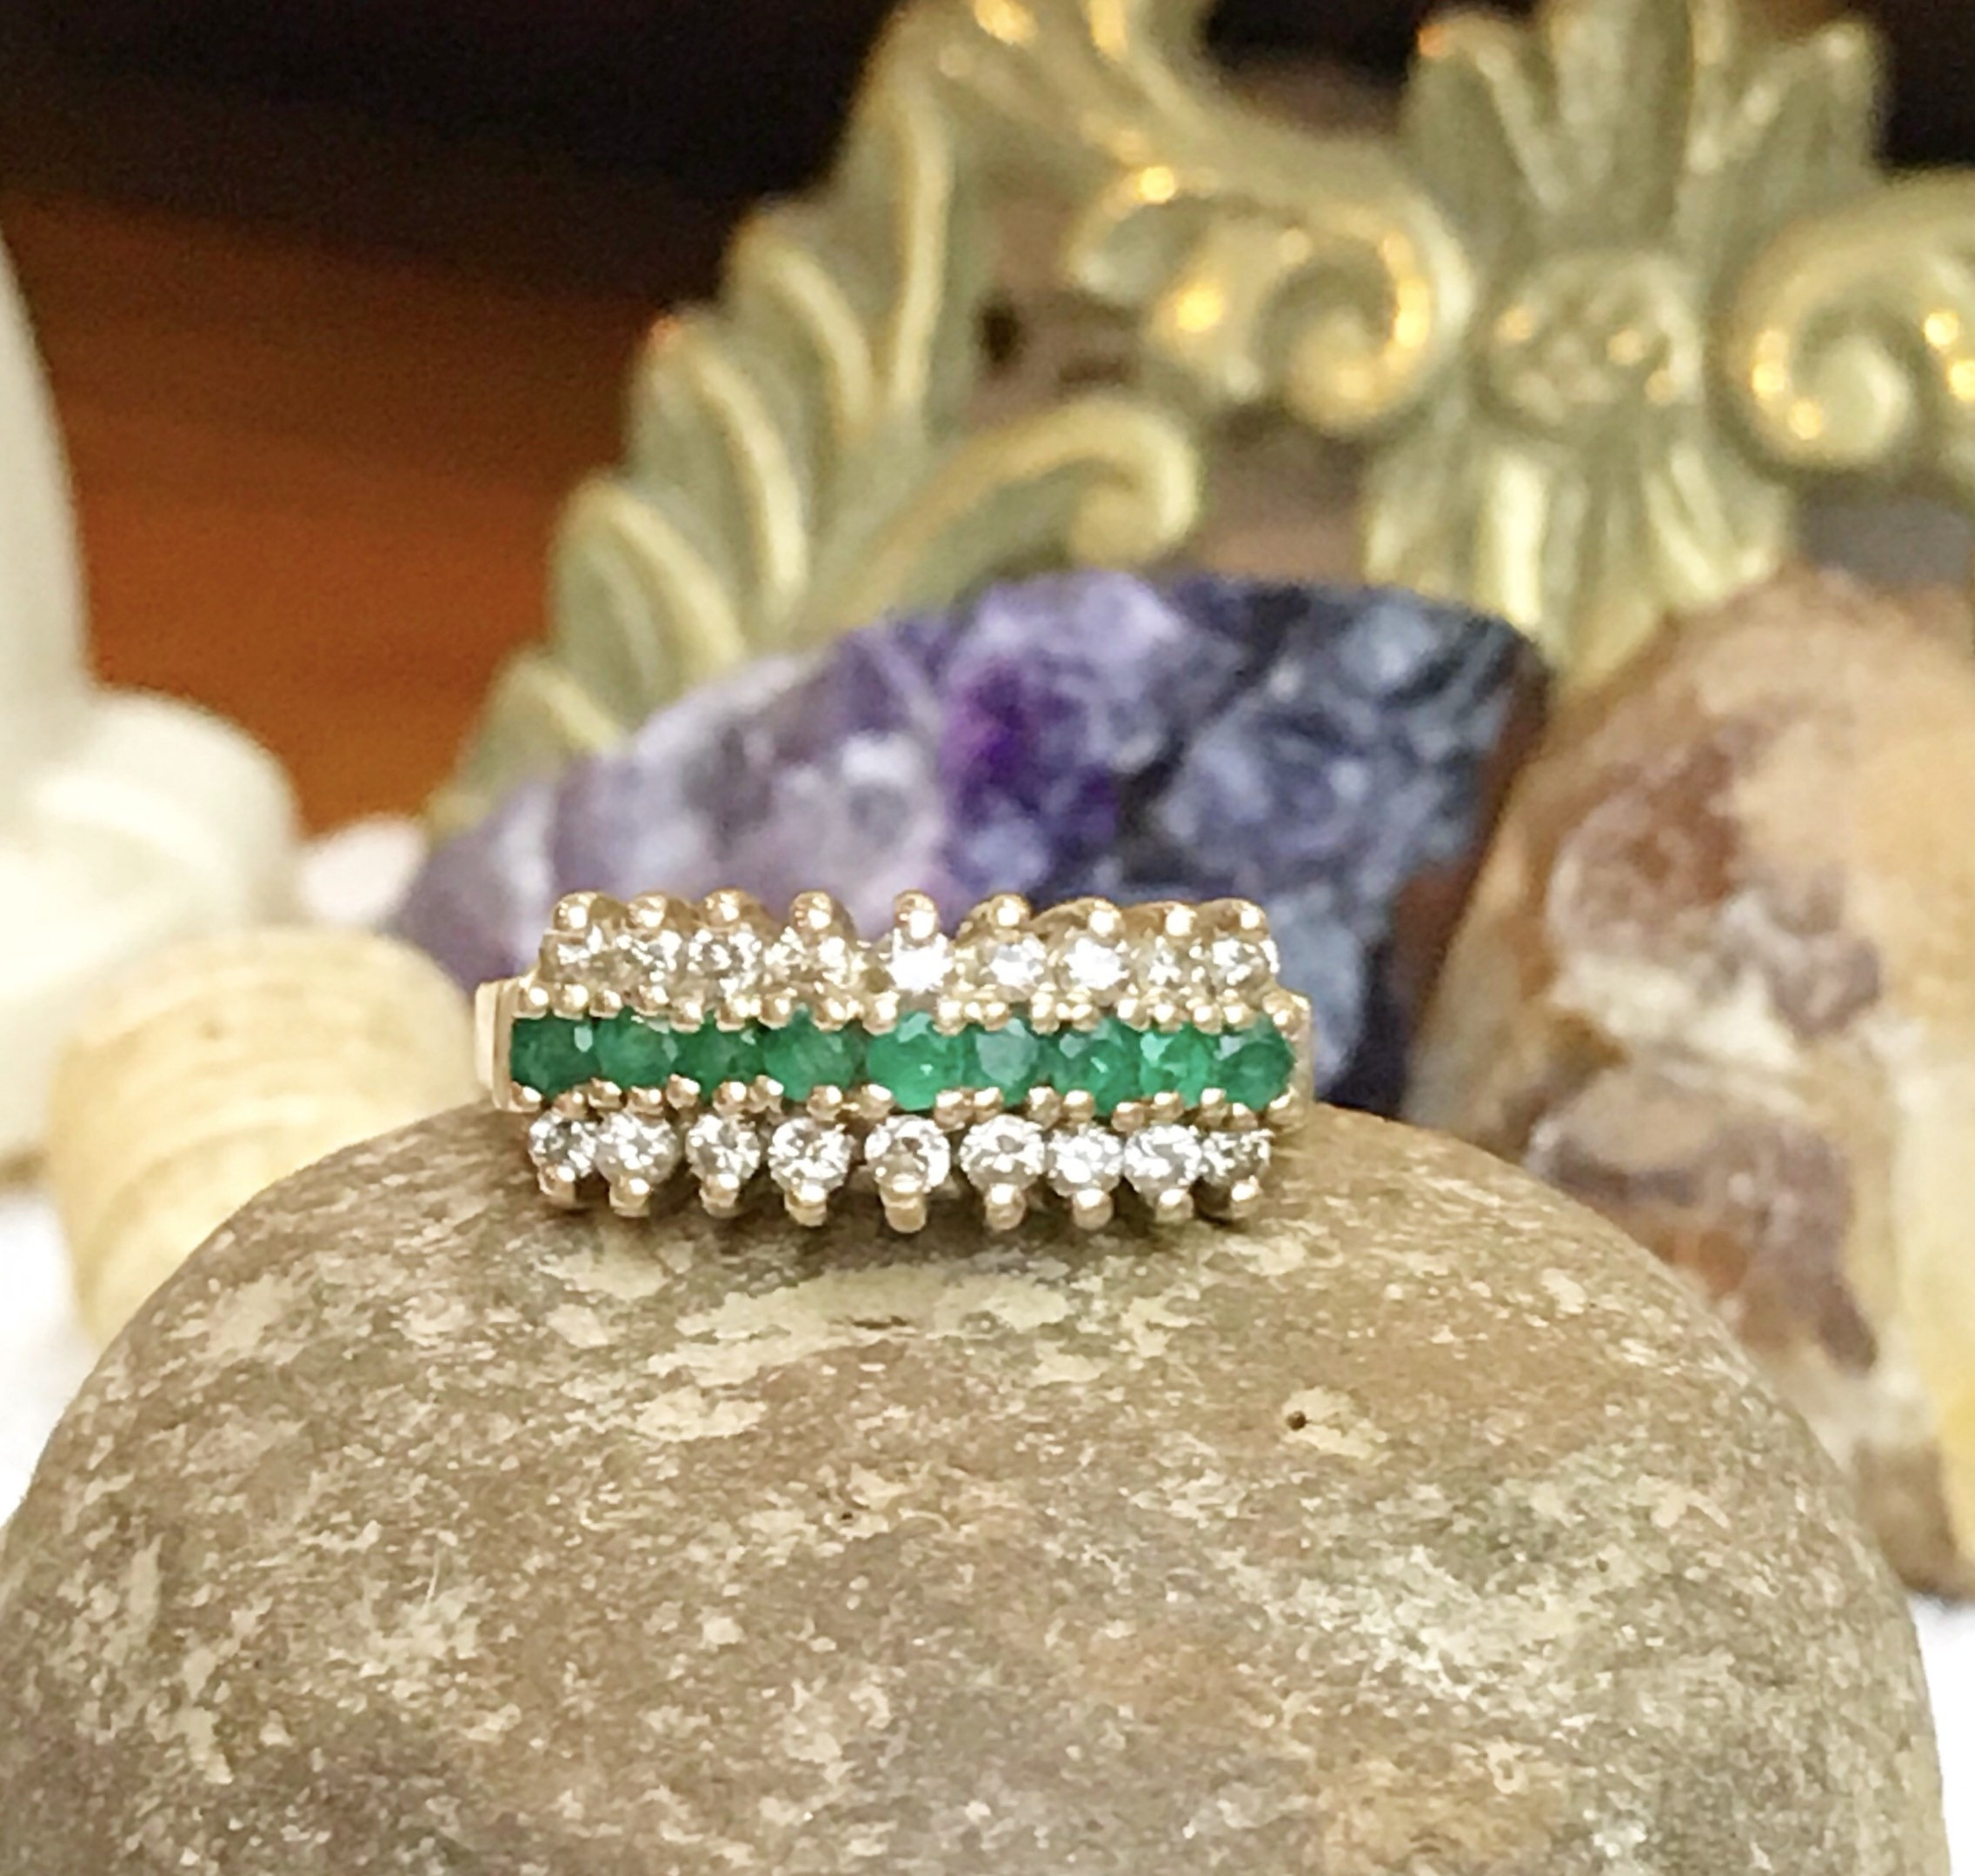 Vintage 14K Yellow Gold Three Row Emerald & Diamond Pyramid Ring, 14K Gold  3 Row Round Emerald And Diamond Tiara Anniversary Ring,  (View 21 of 25)